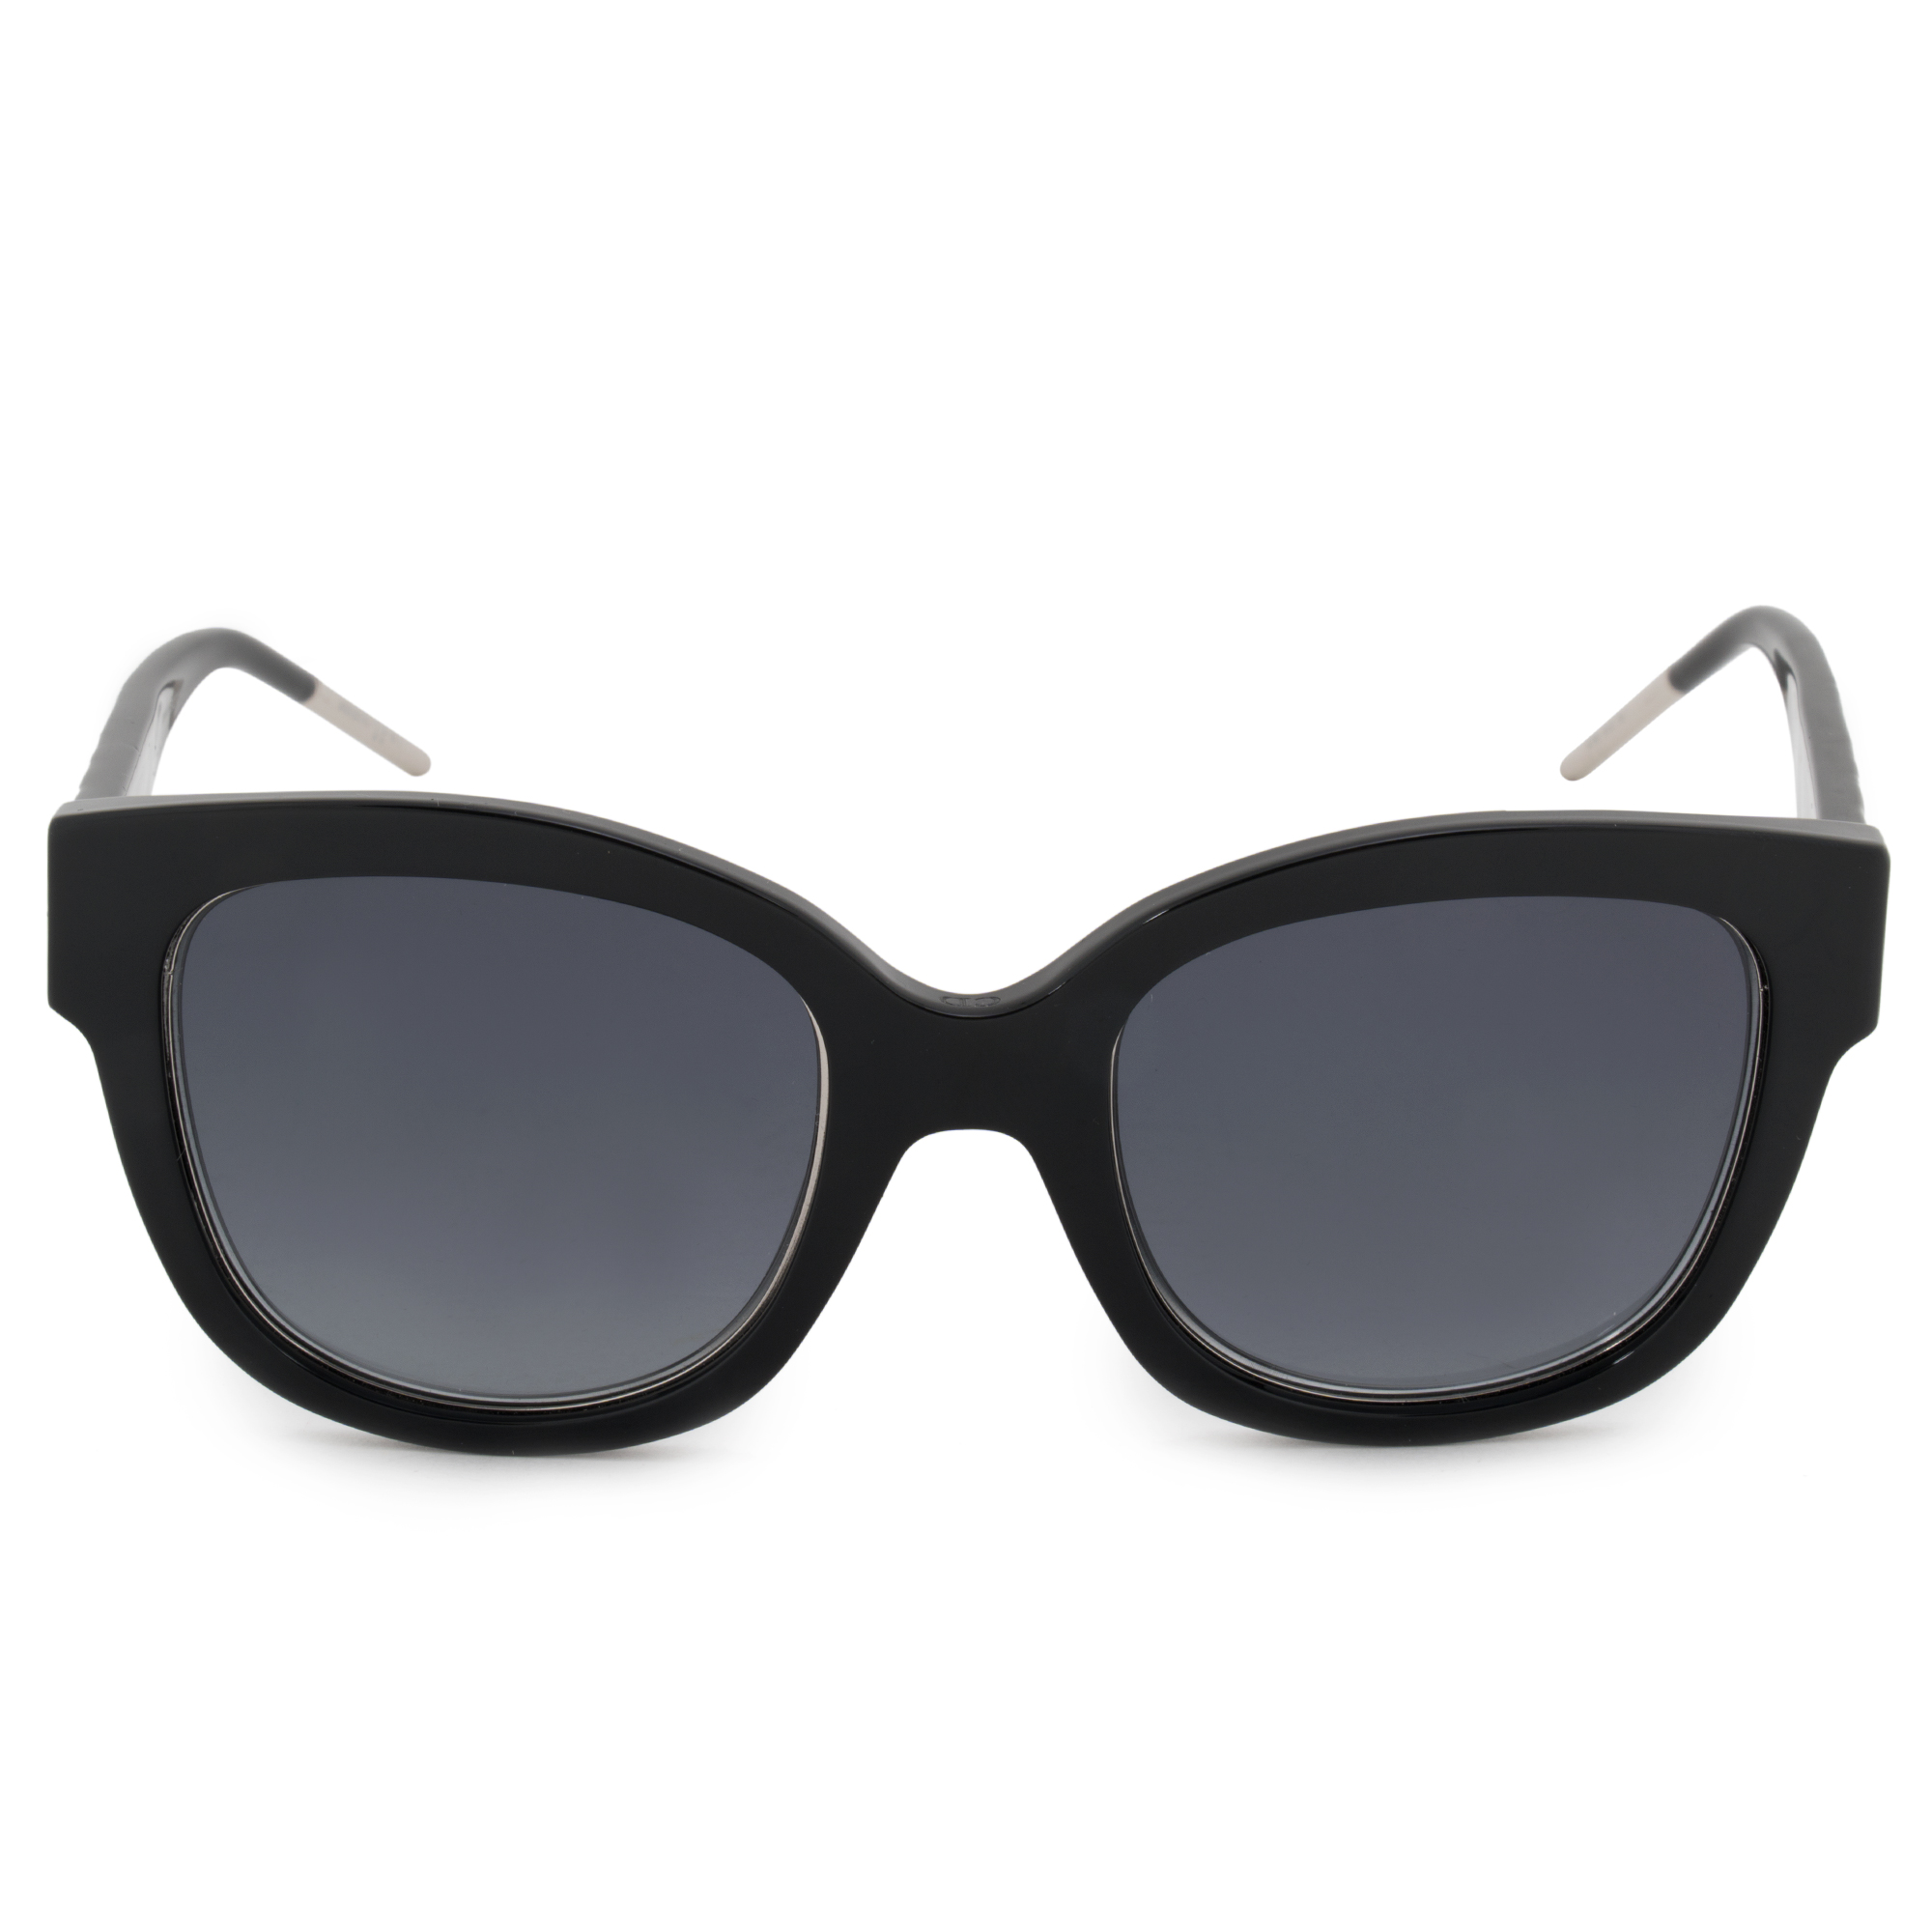 06e178bd2b9 Christian dior christian dior very cat eye sunglasses jpg 2000x2000 Dior  cateye sunglasses